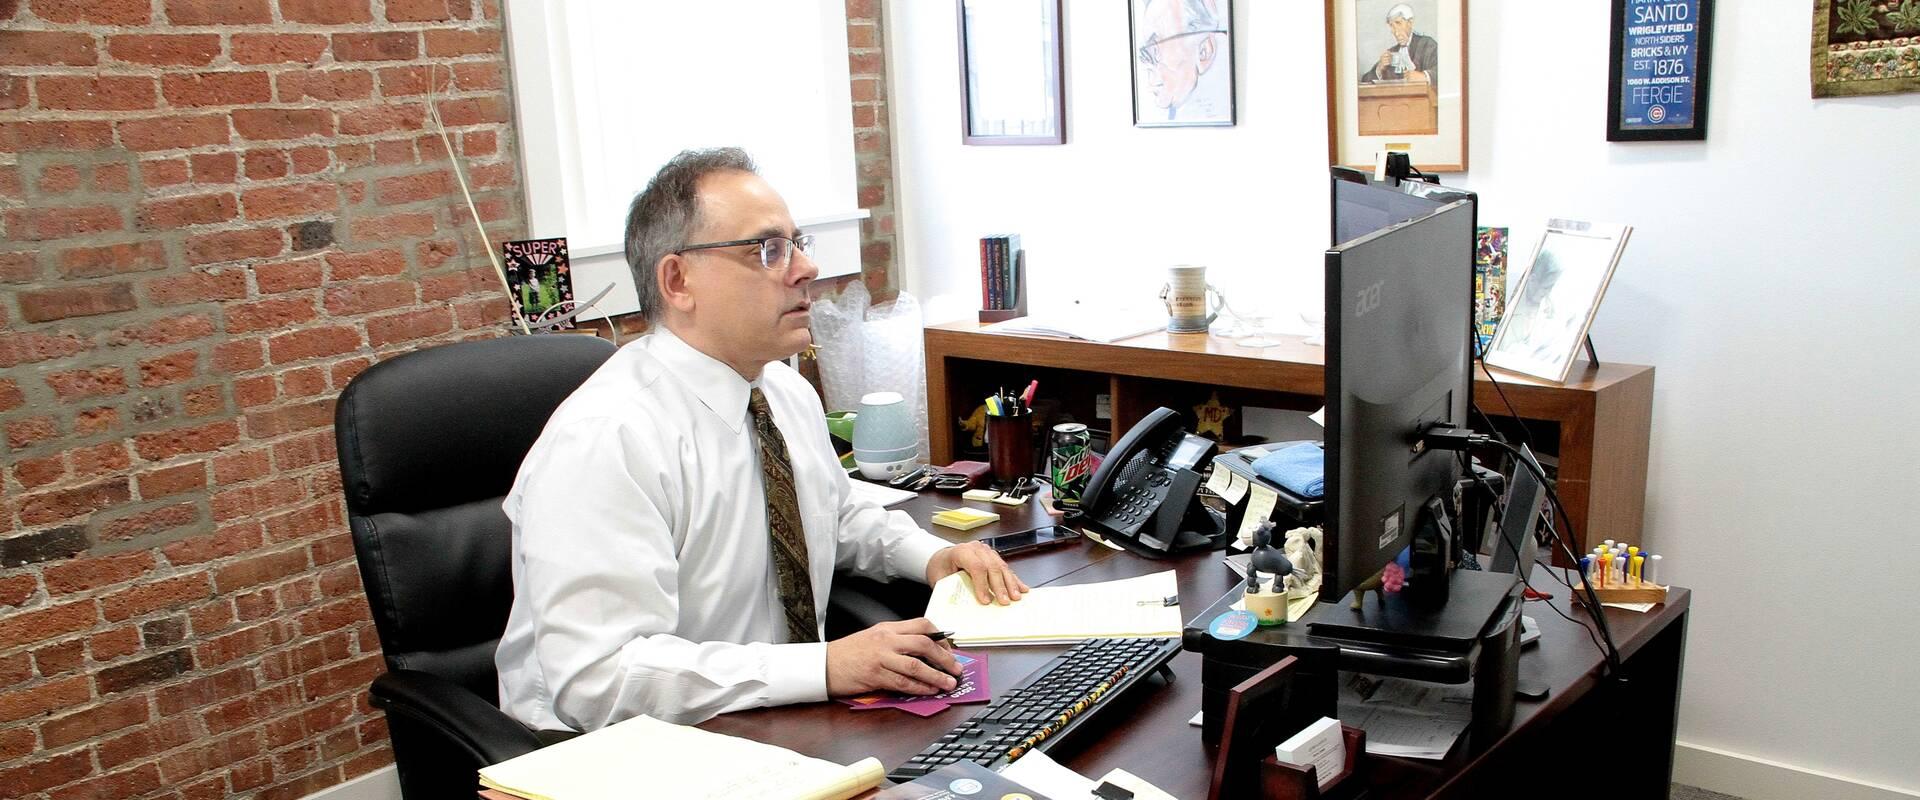 Administrative Proceedings